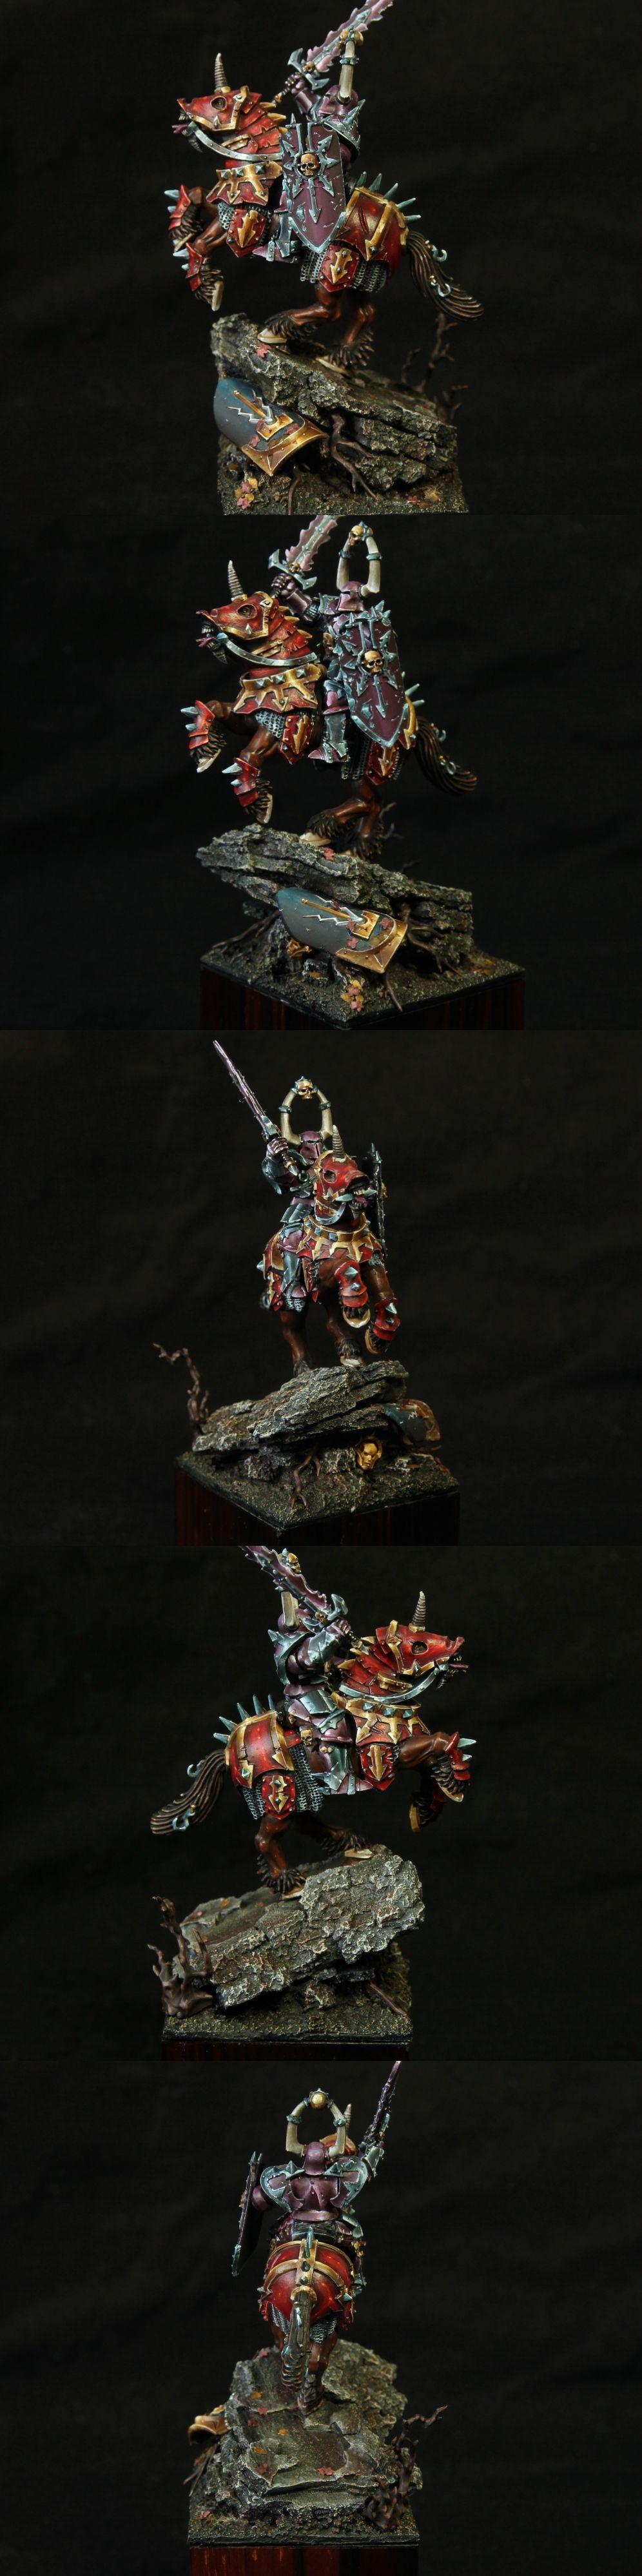 Chaos Knight NMM